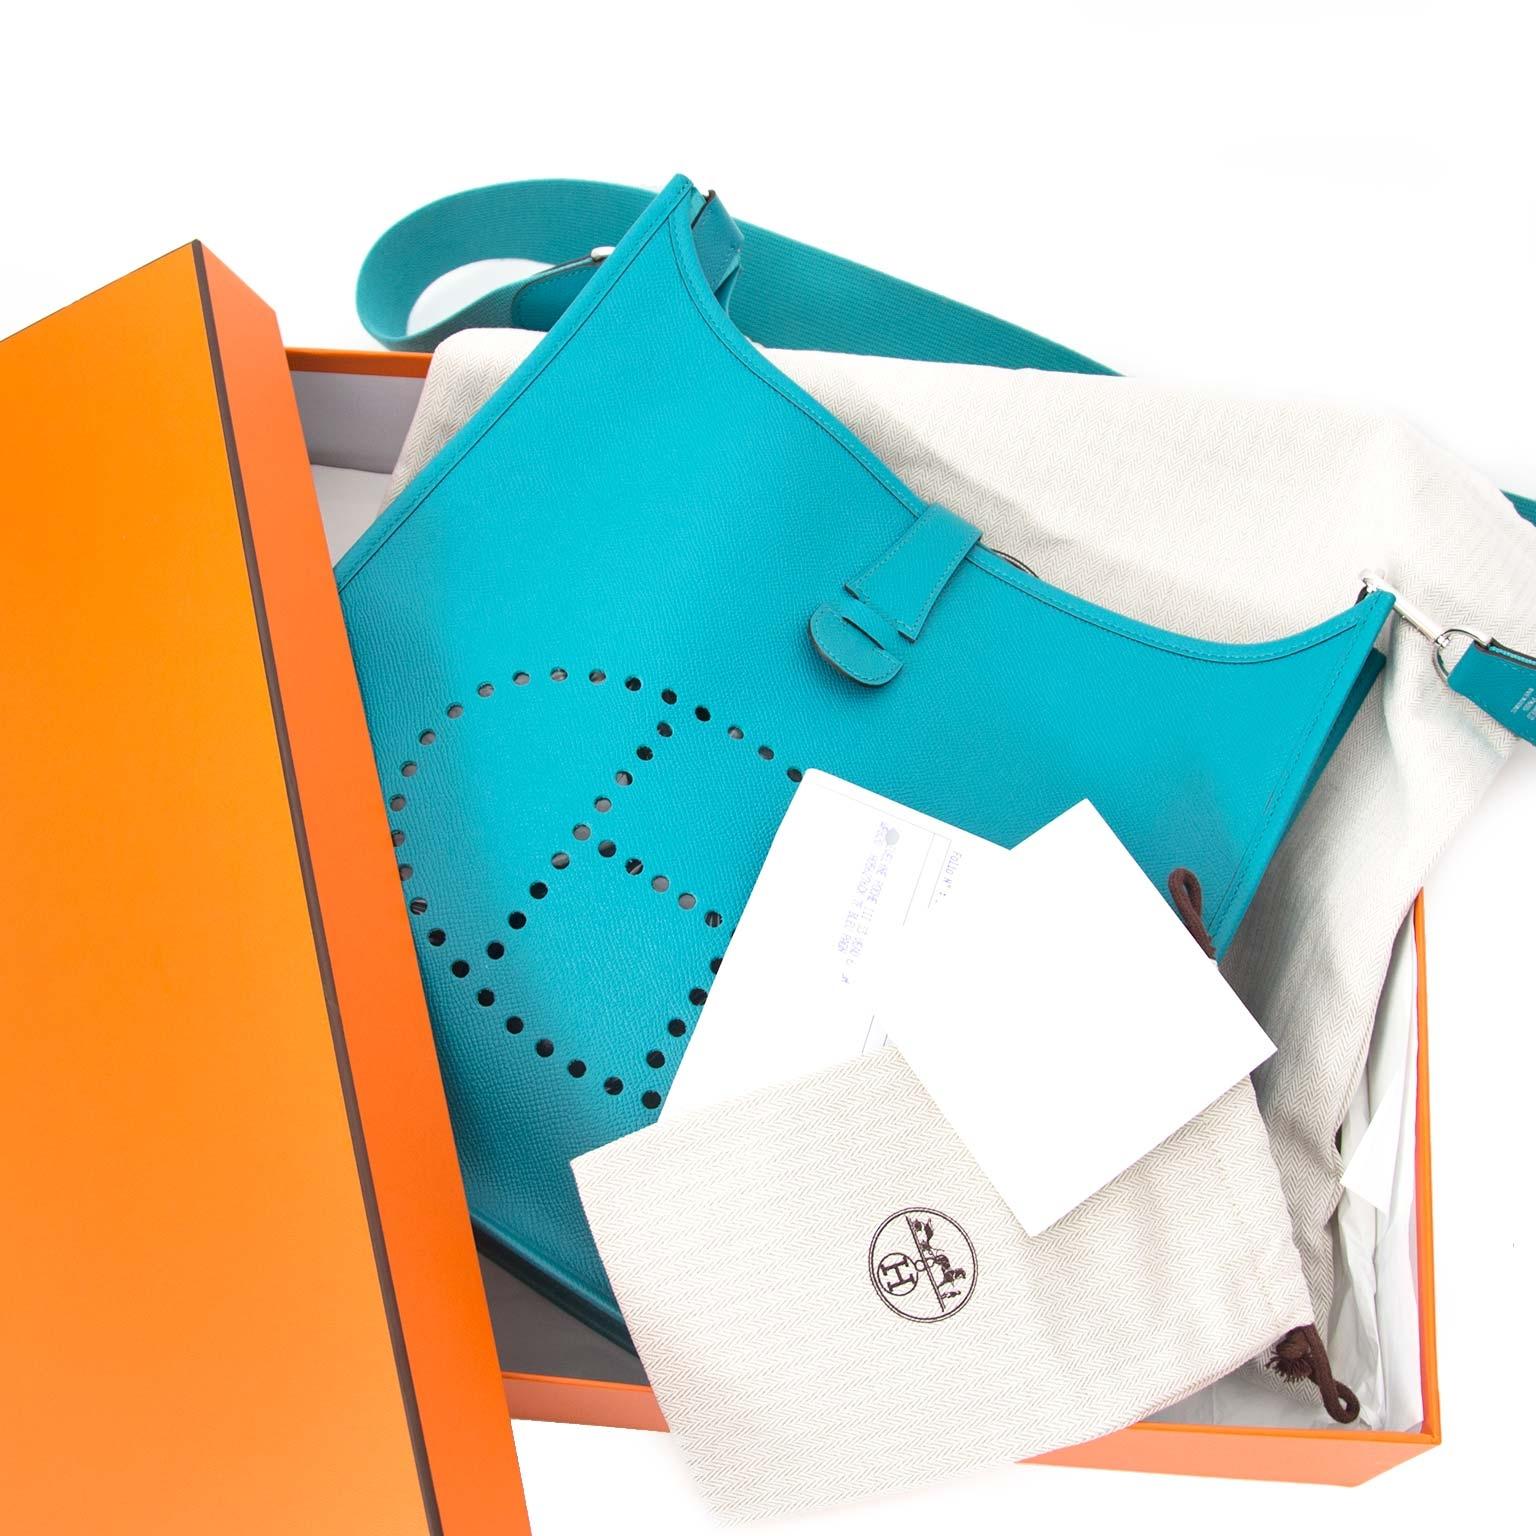 koop veiilg online tegen de beste prijs Hermes Evelyne Veau Epsom Bag